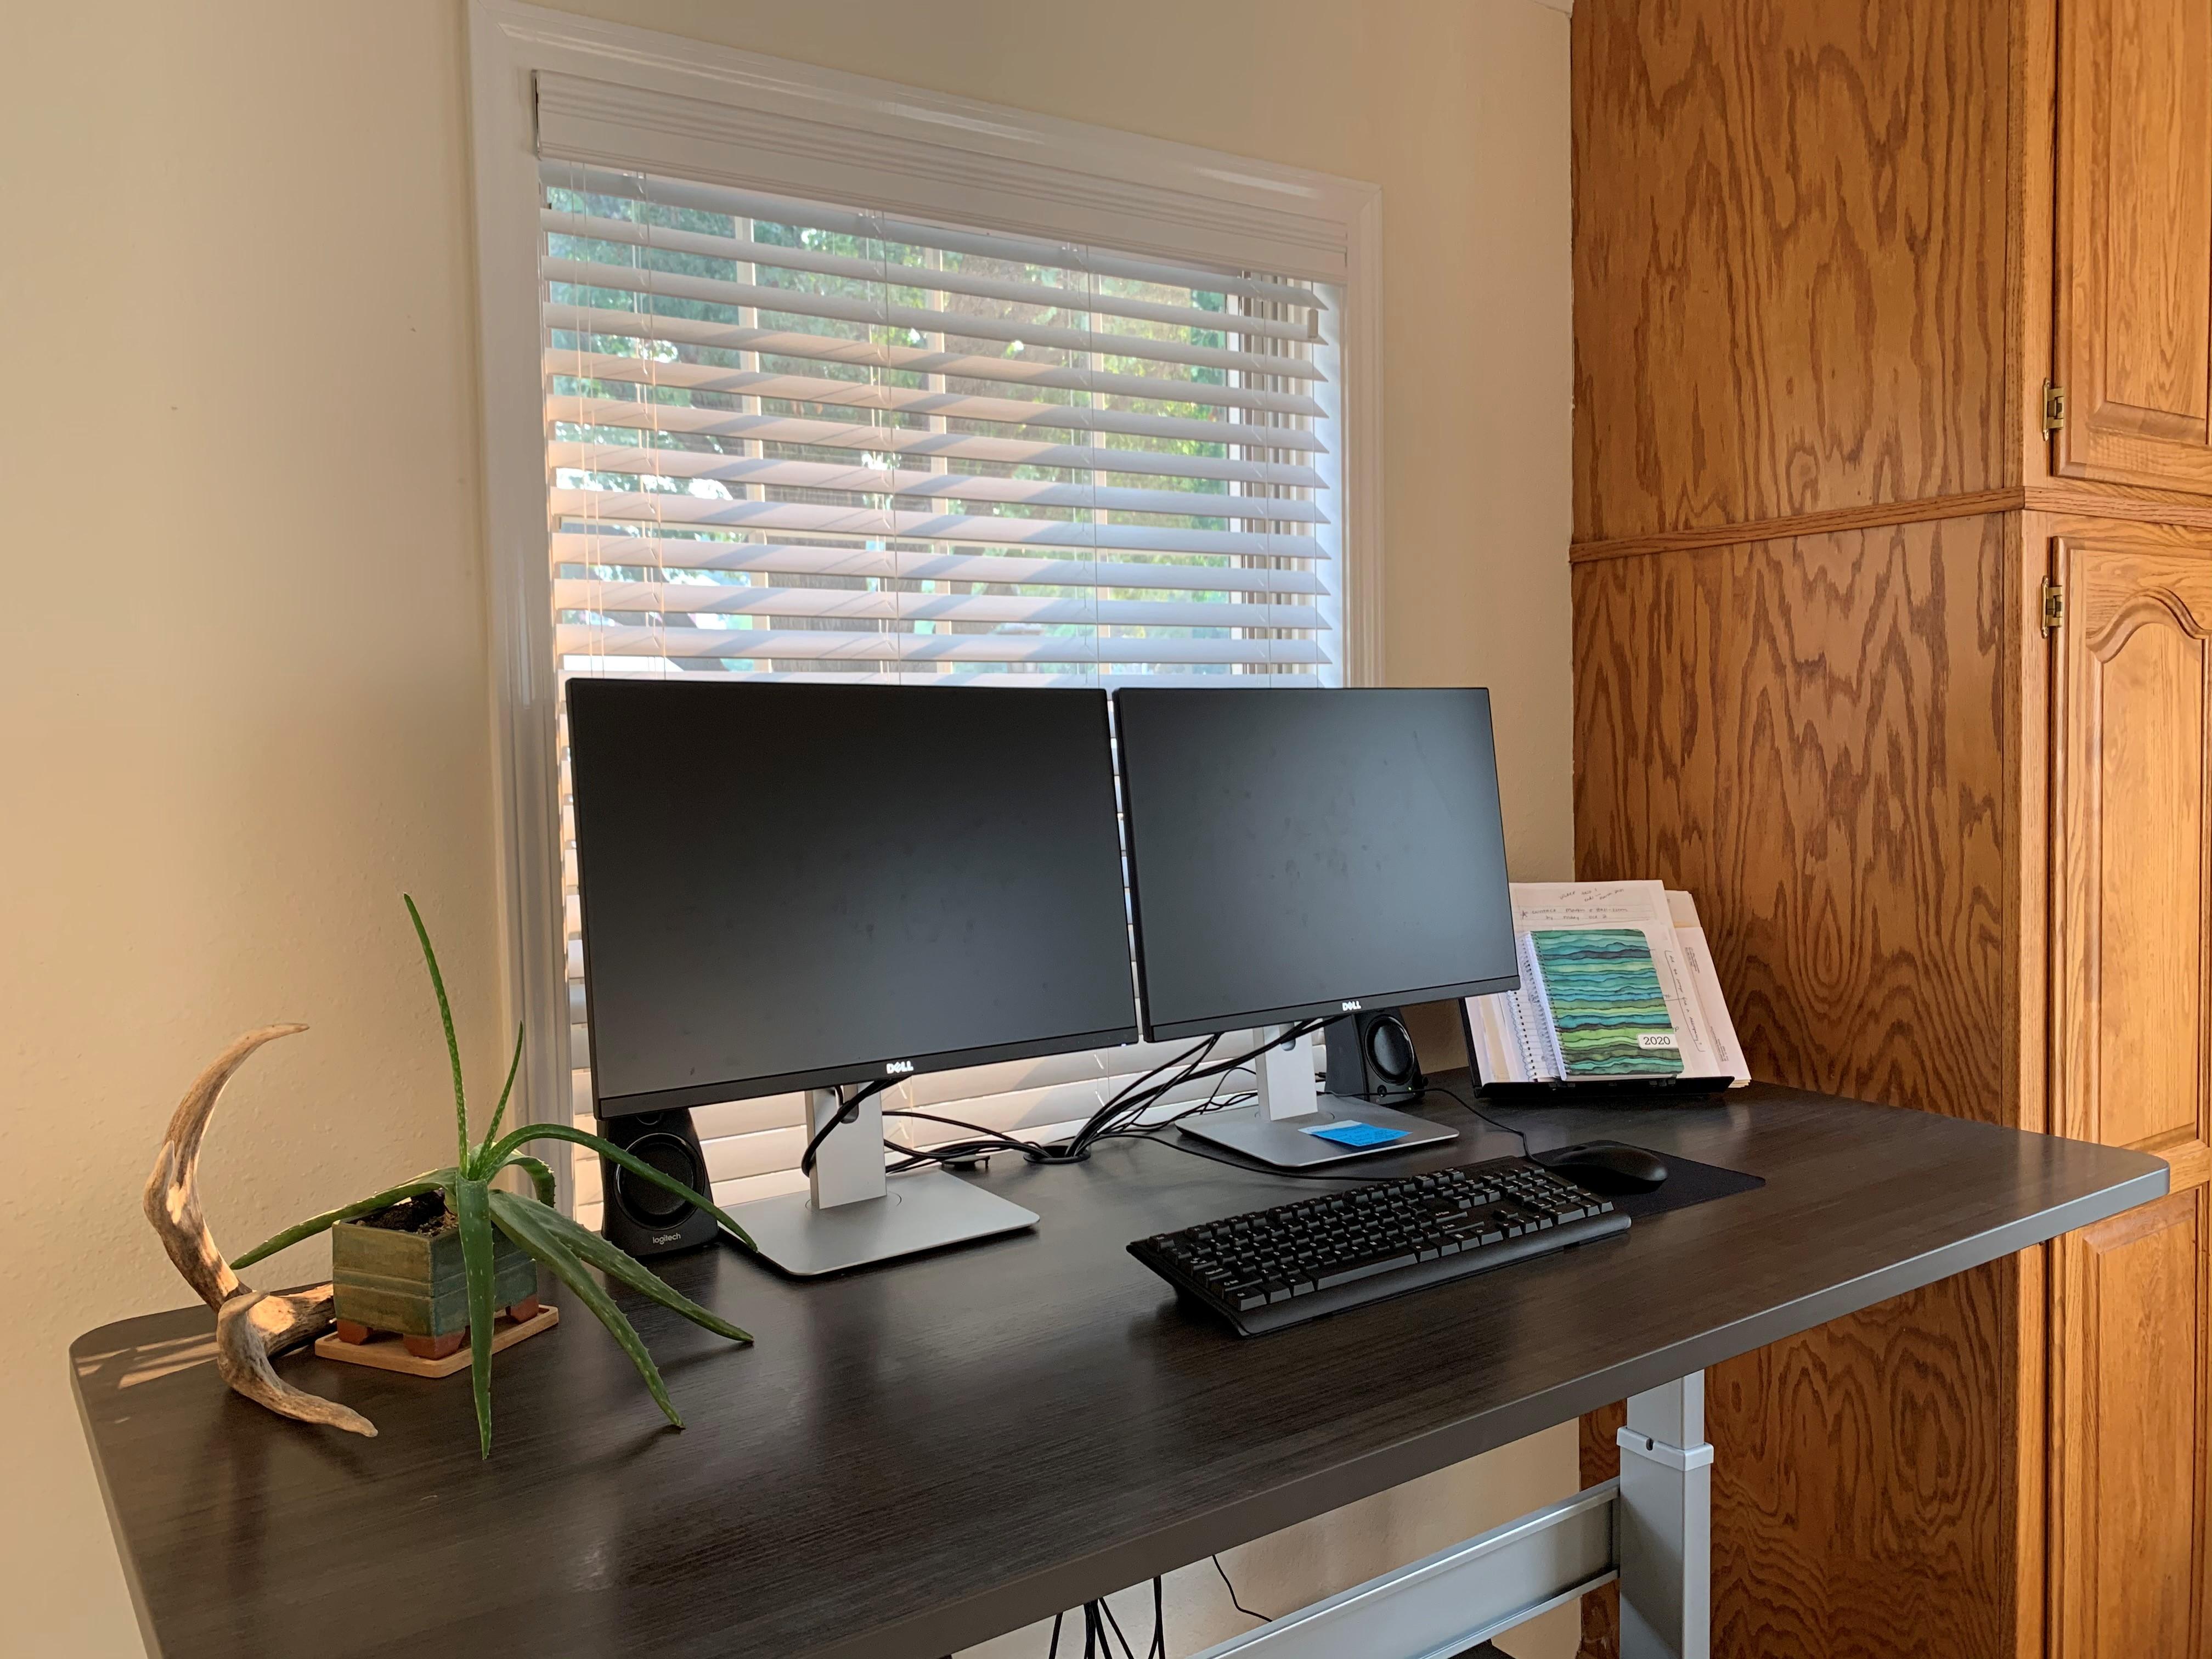 "30"" x 70"" Driftwood Laminate Top with Silver VertDesk Adjustable Height Desk Frame"